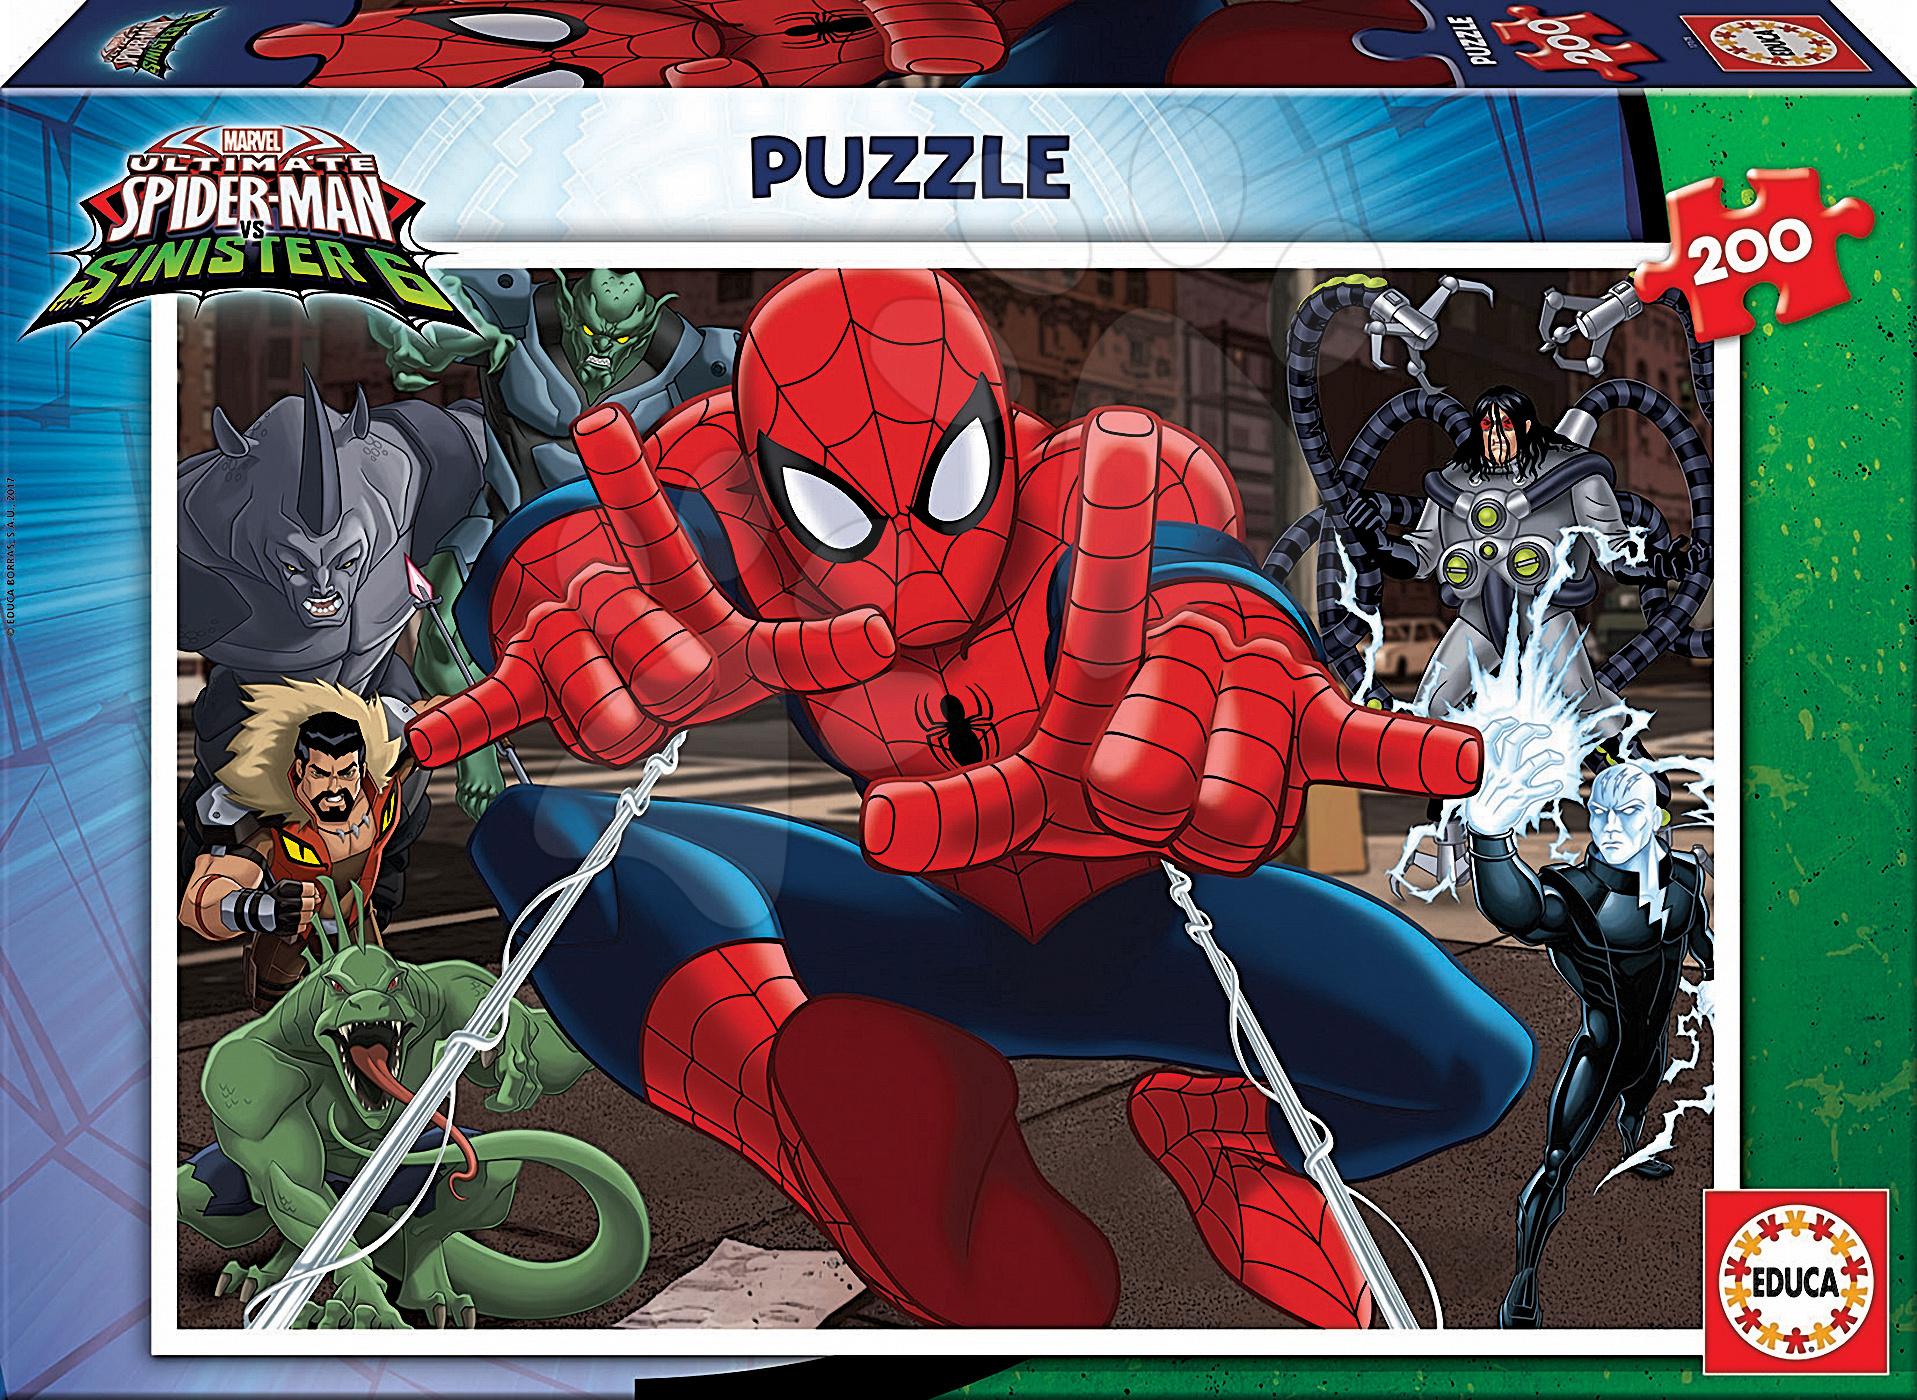 Puzzle Ultimate Spiderman vs. Sinister Educa 200 dílů od 8 let